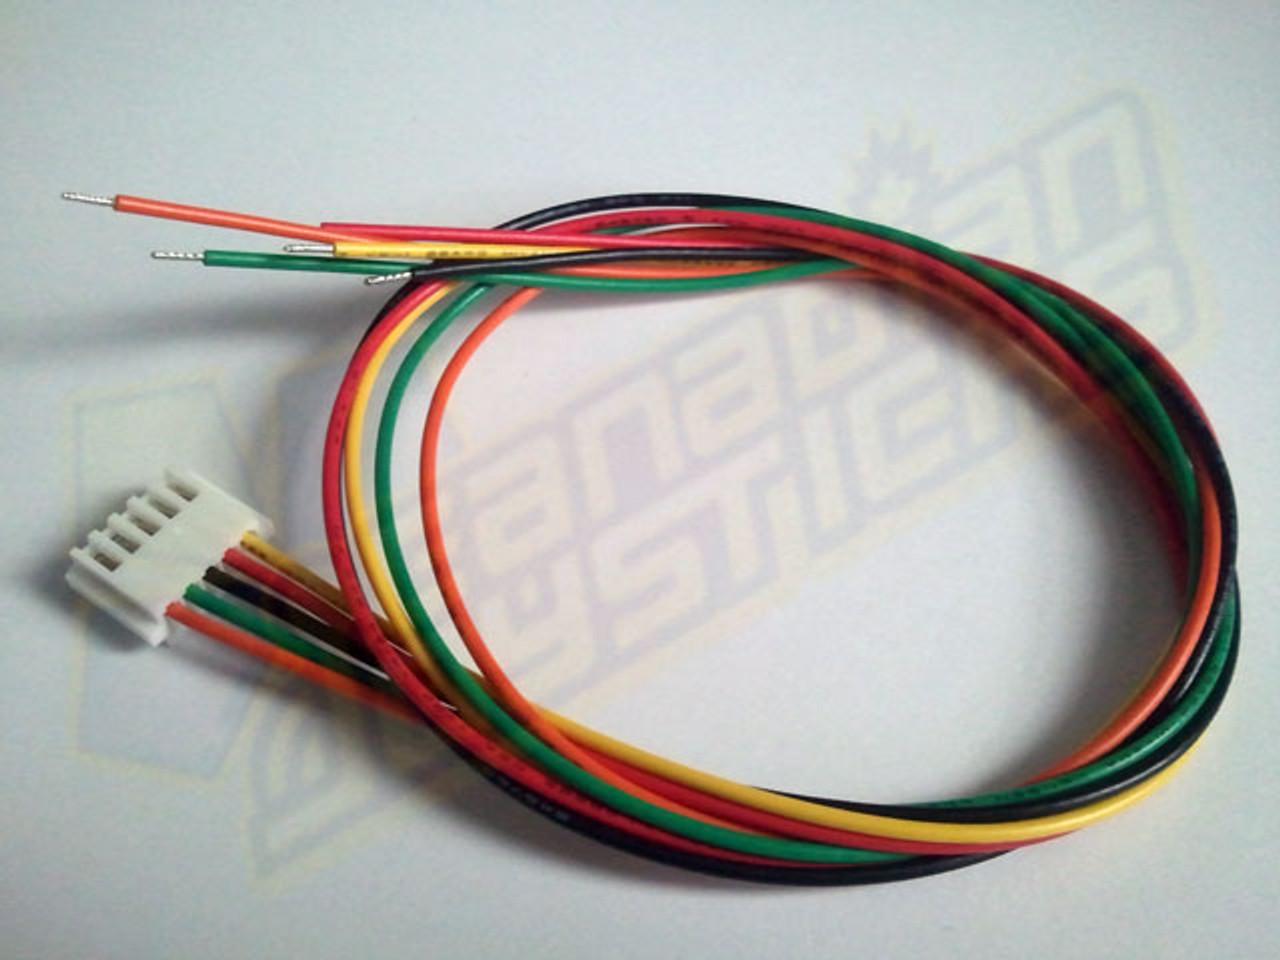 Sanwa_JLF H__12137.1306873457?c=2 category joysticks & parts sanwa denshi co ltd canadian sanwa wiring harness at eliteediting.co